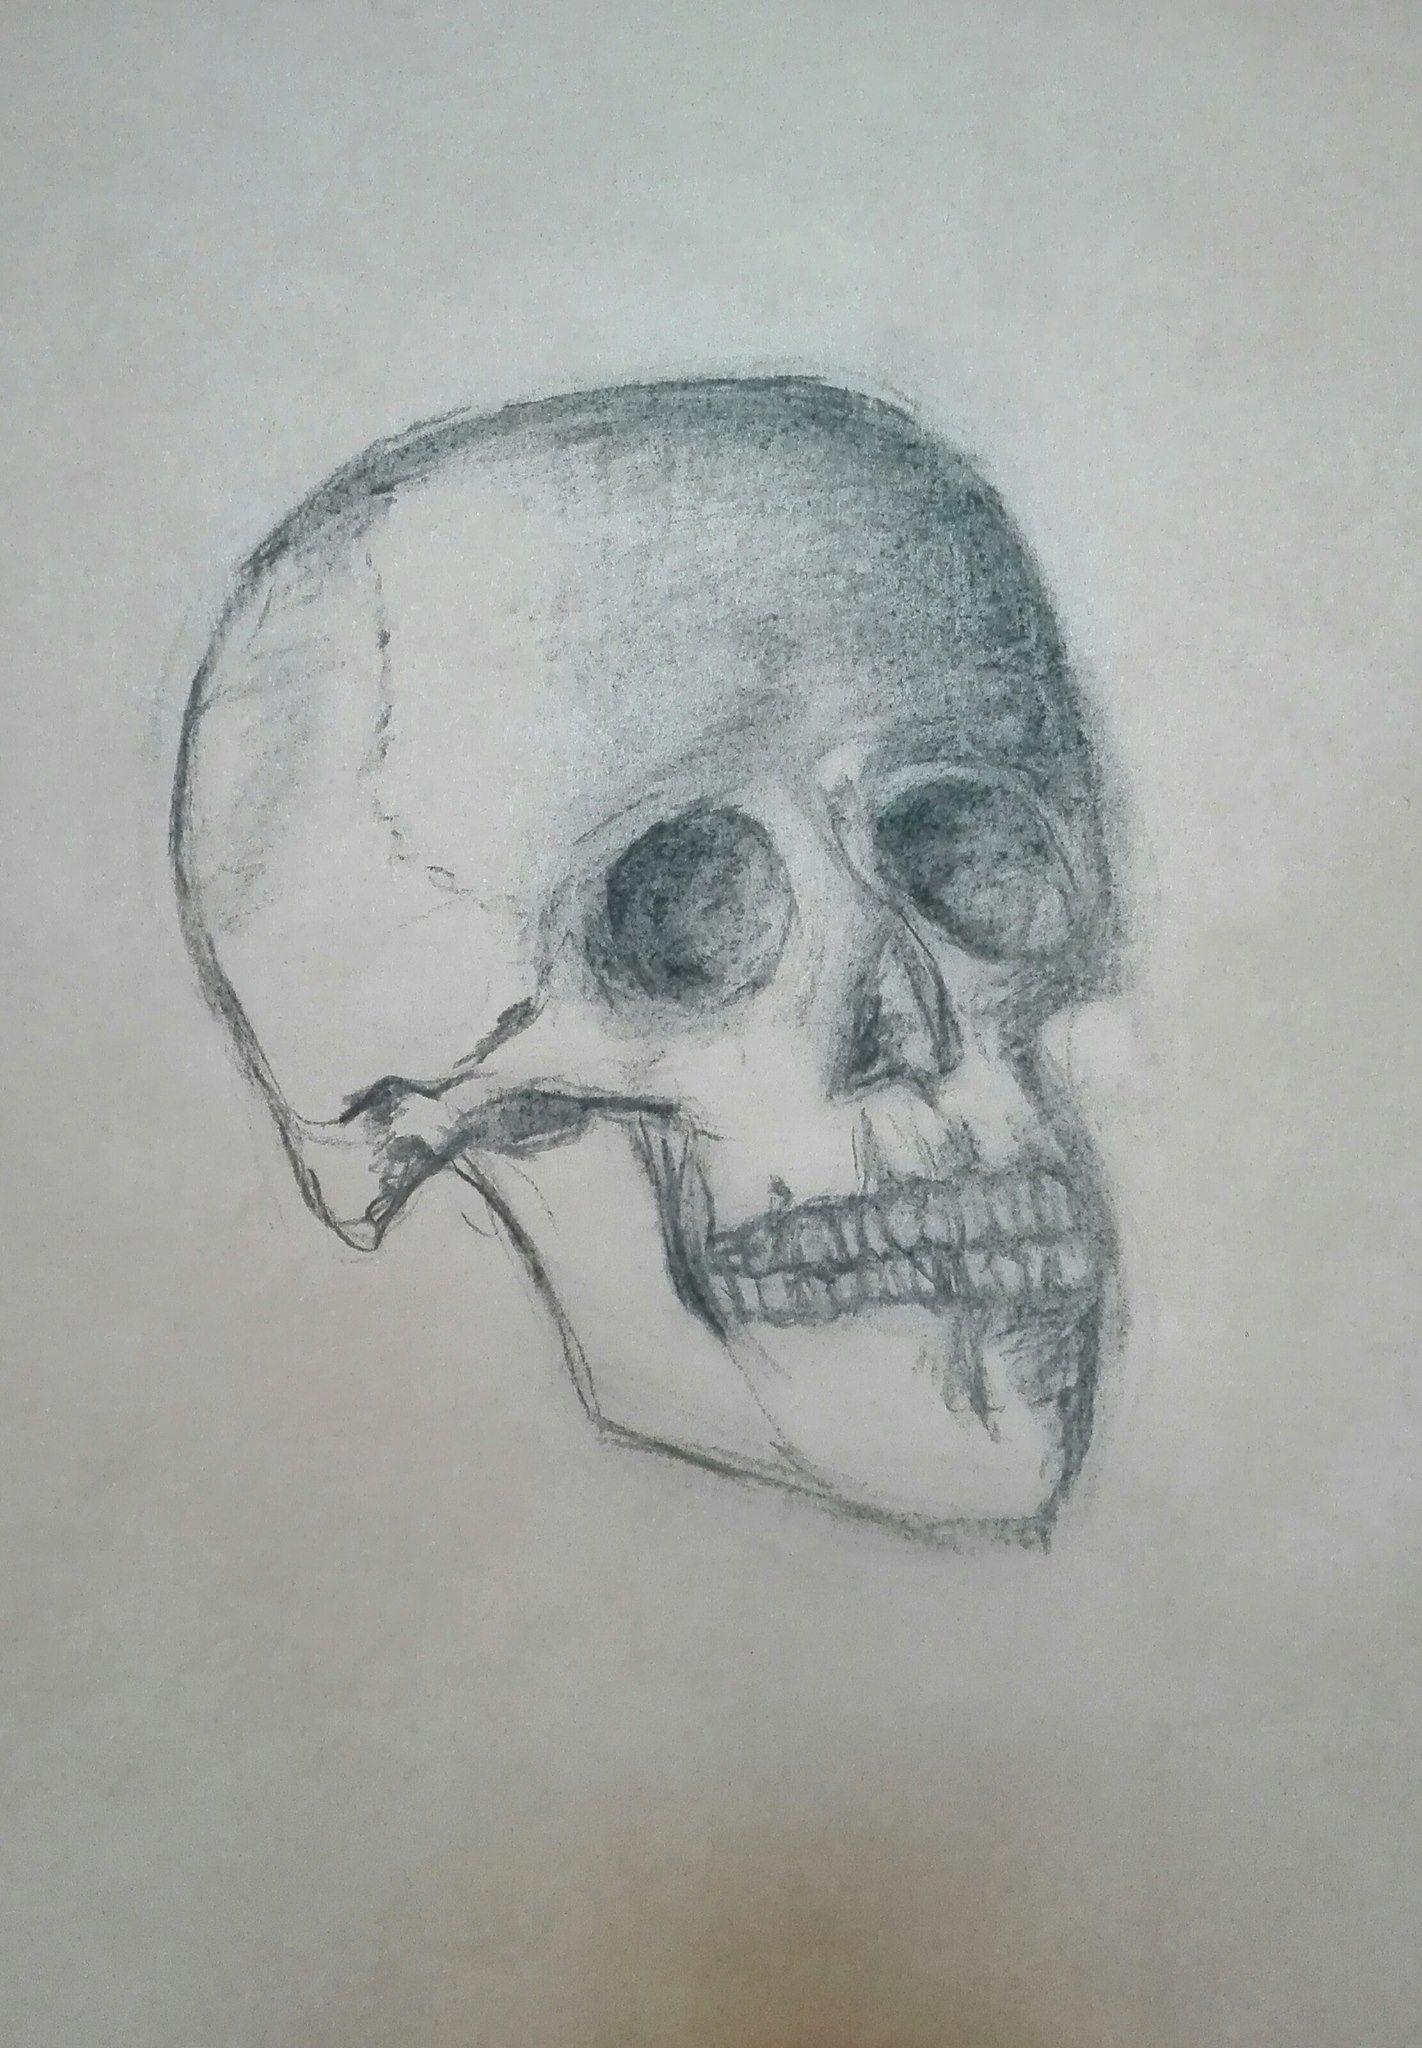 Kurz Pripravy Na Talentovky Kresba Uhlem Lebka Studie Podle